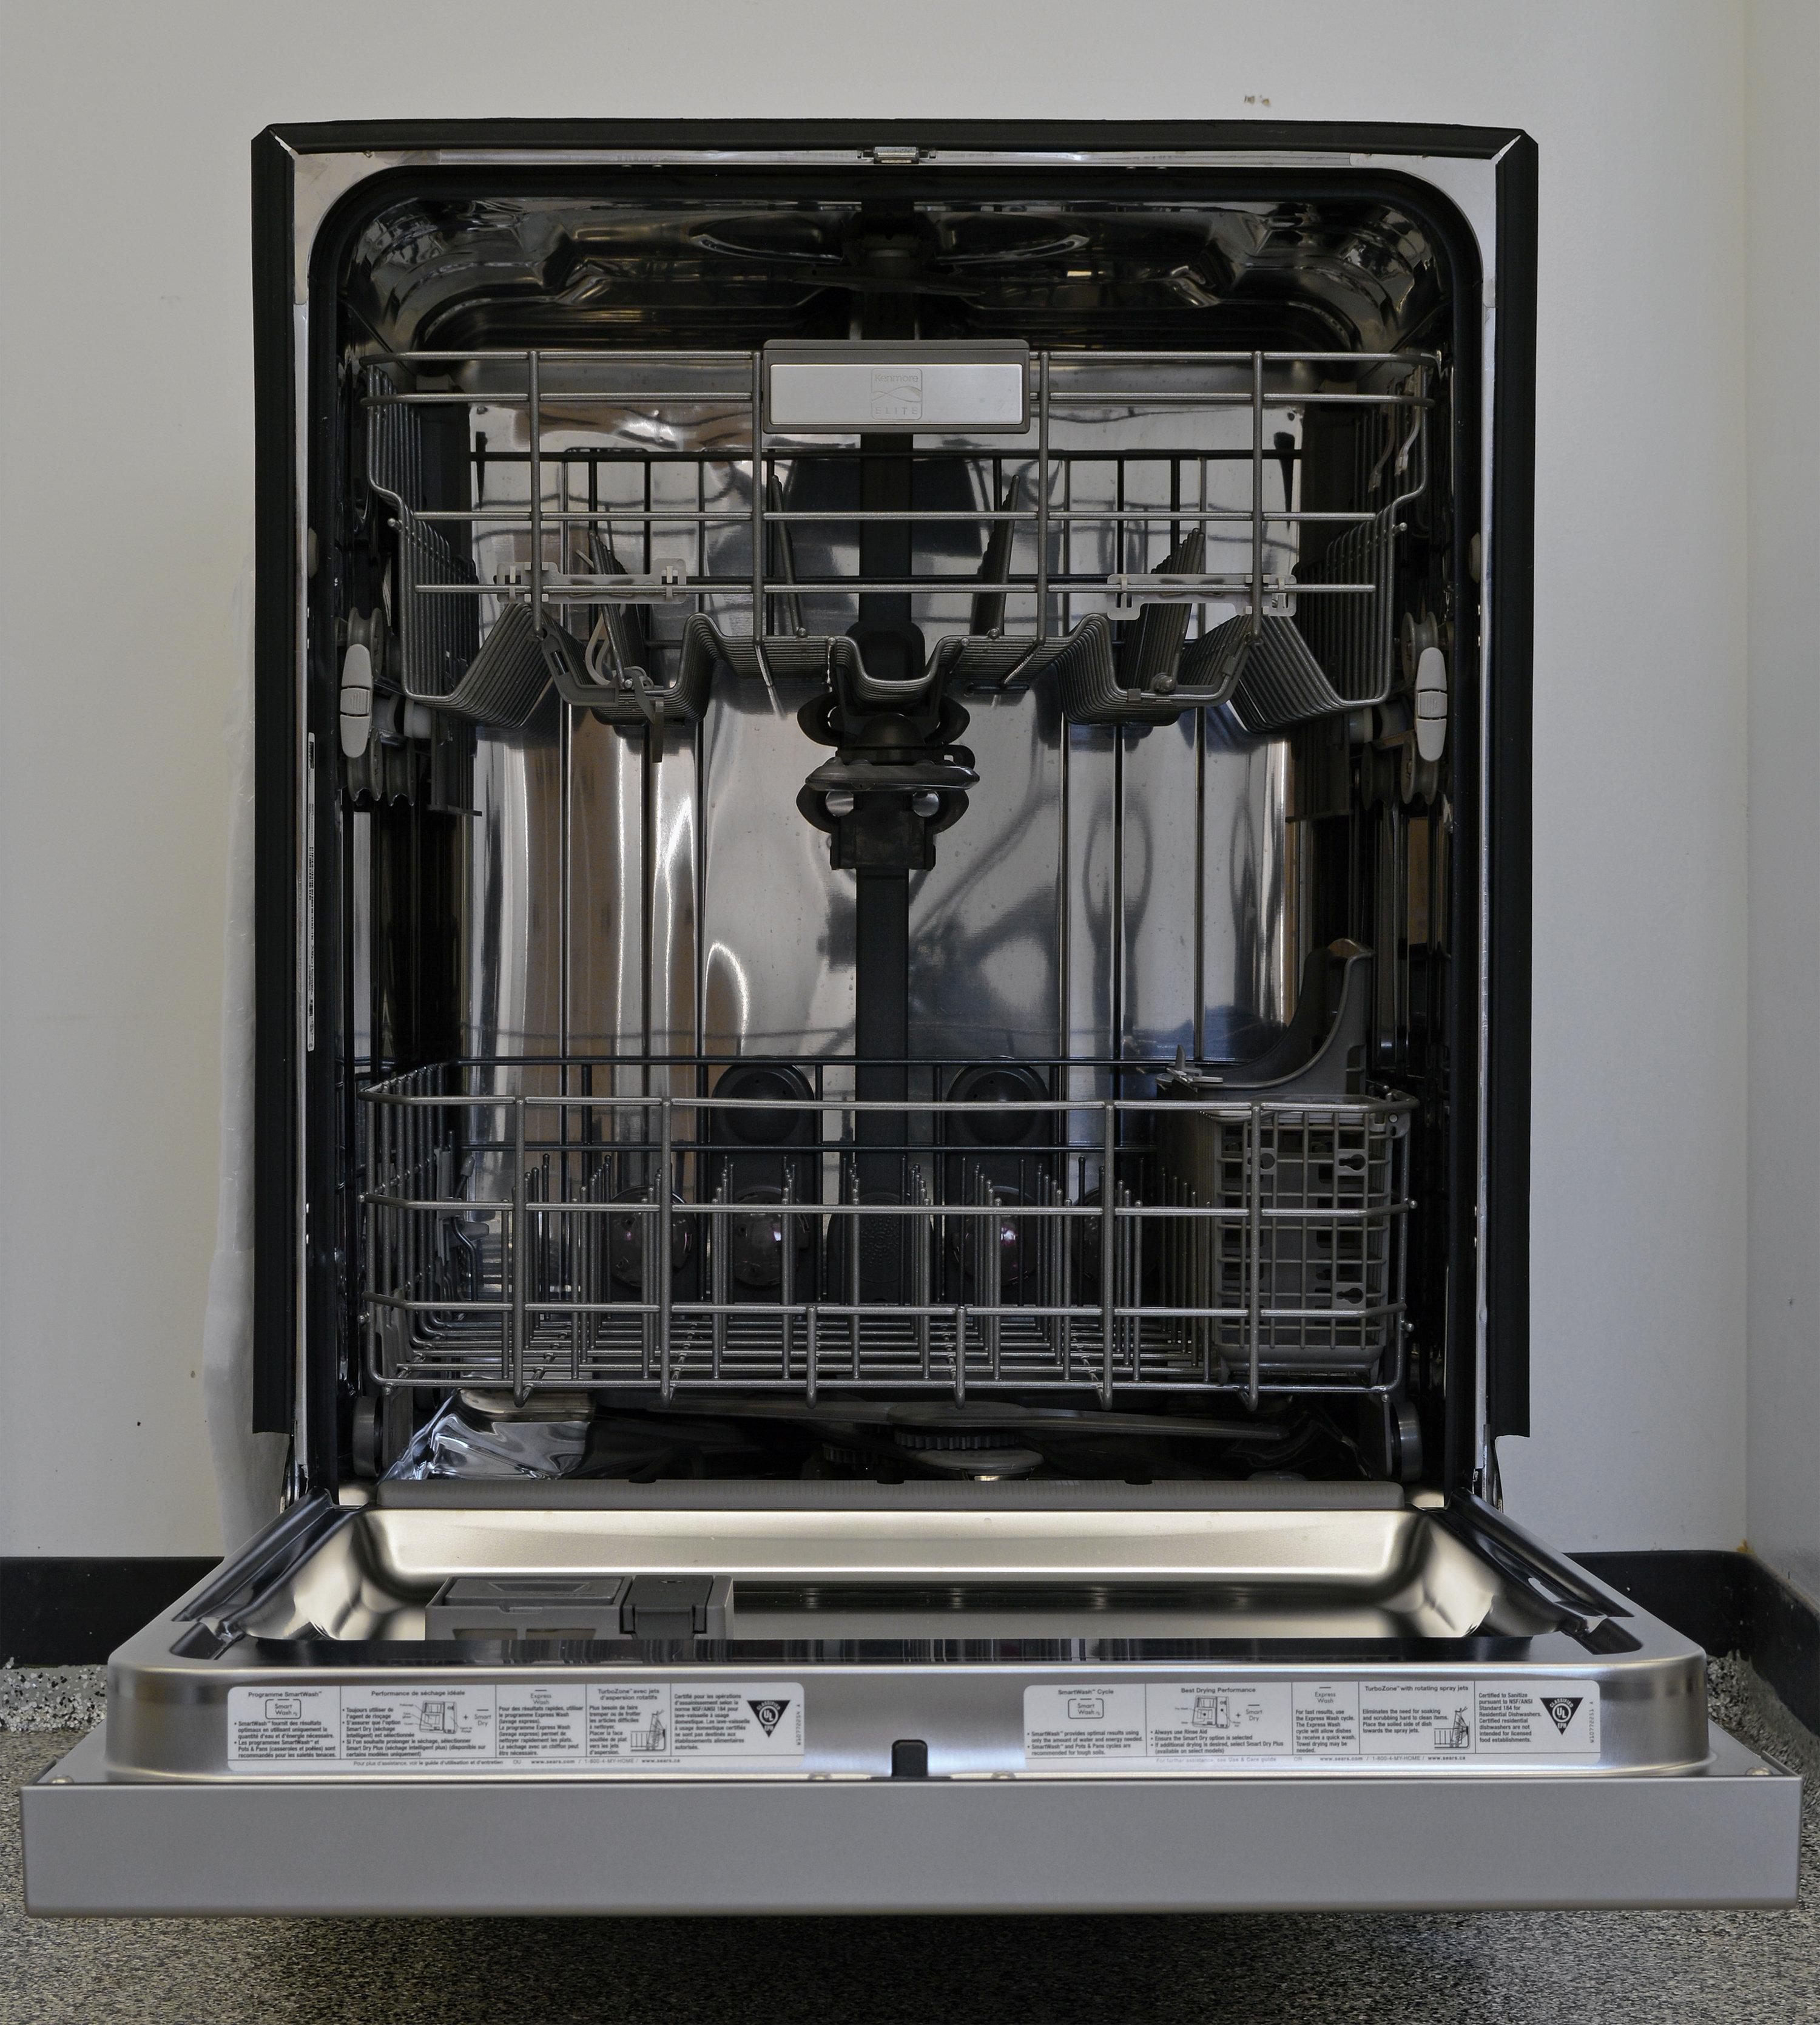 Kenmore Elite 14743 Dishwasher Review Reviewed Com